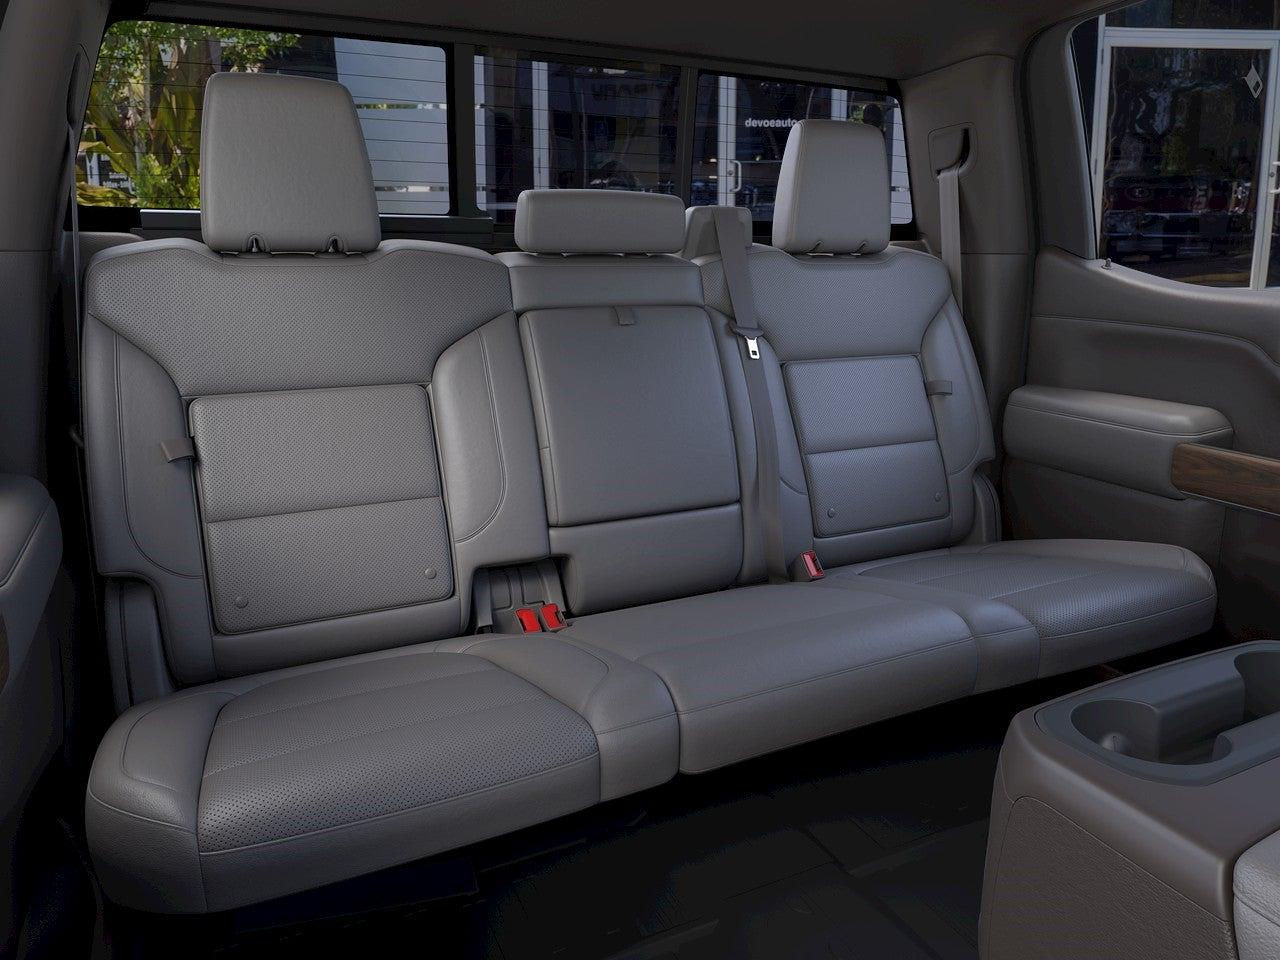 2021 GMC Sierra 1500 Crew Cab 4x4, Pickup #T21448 - photo 14